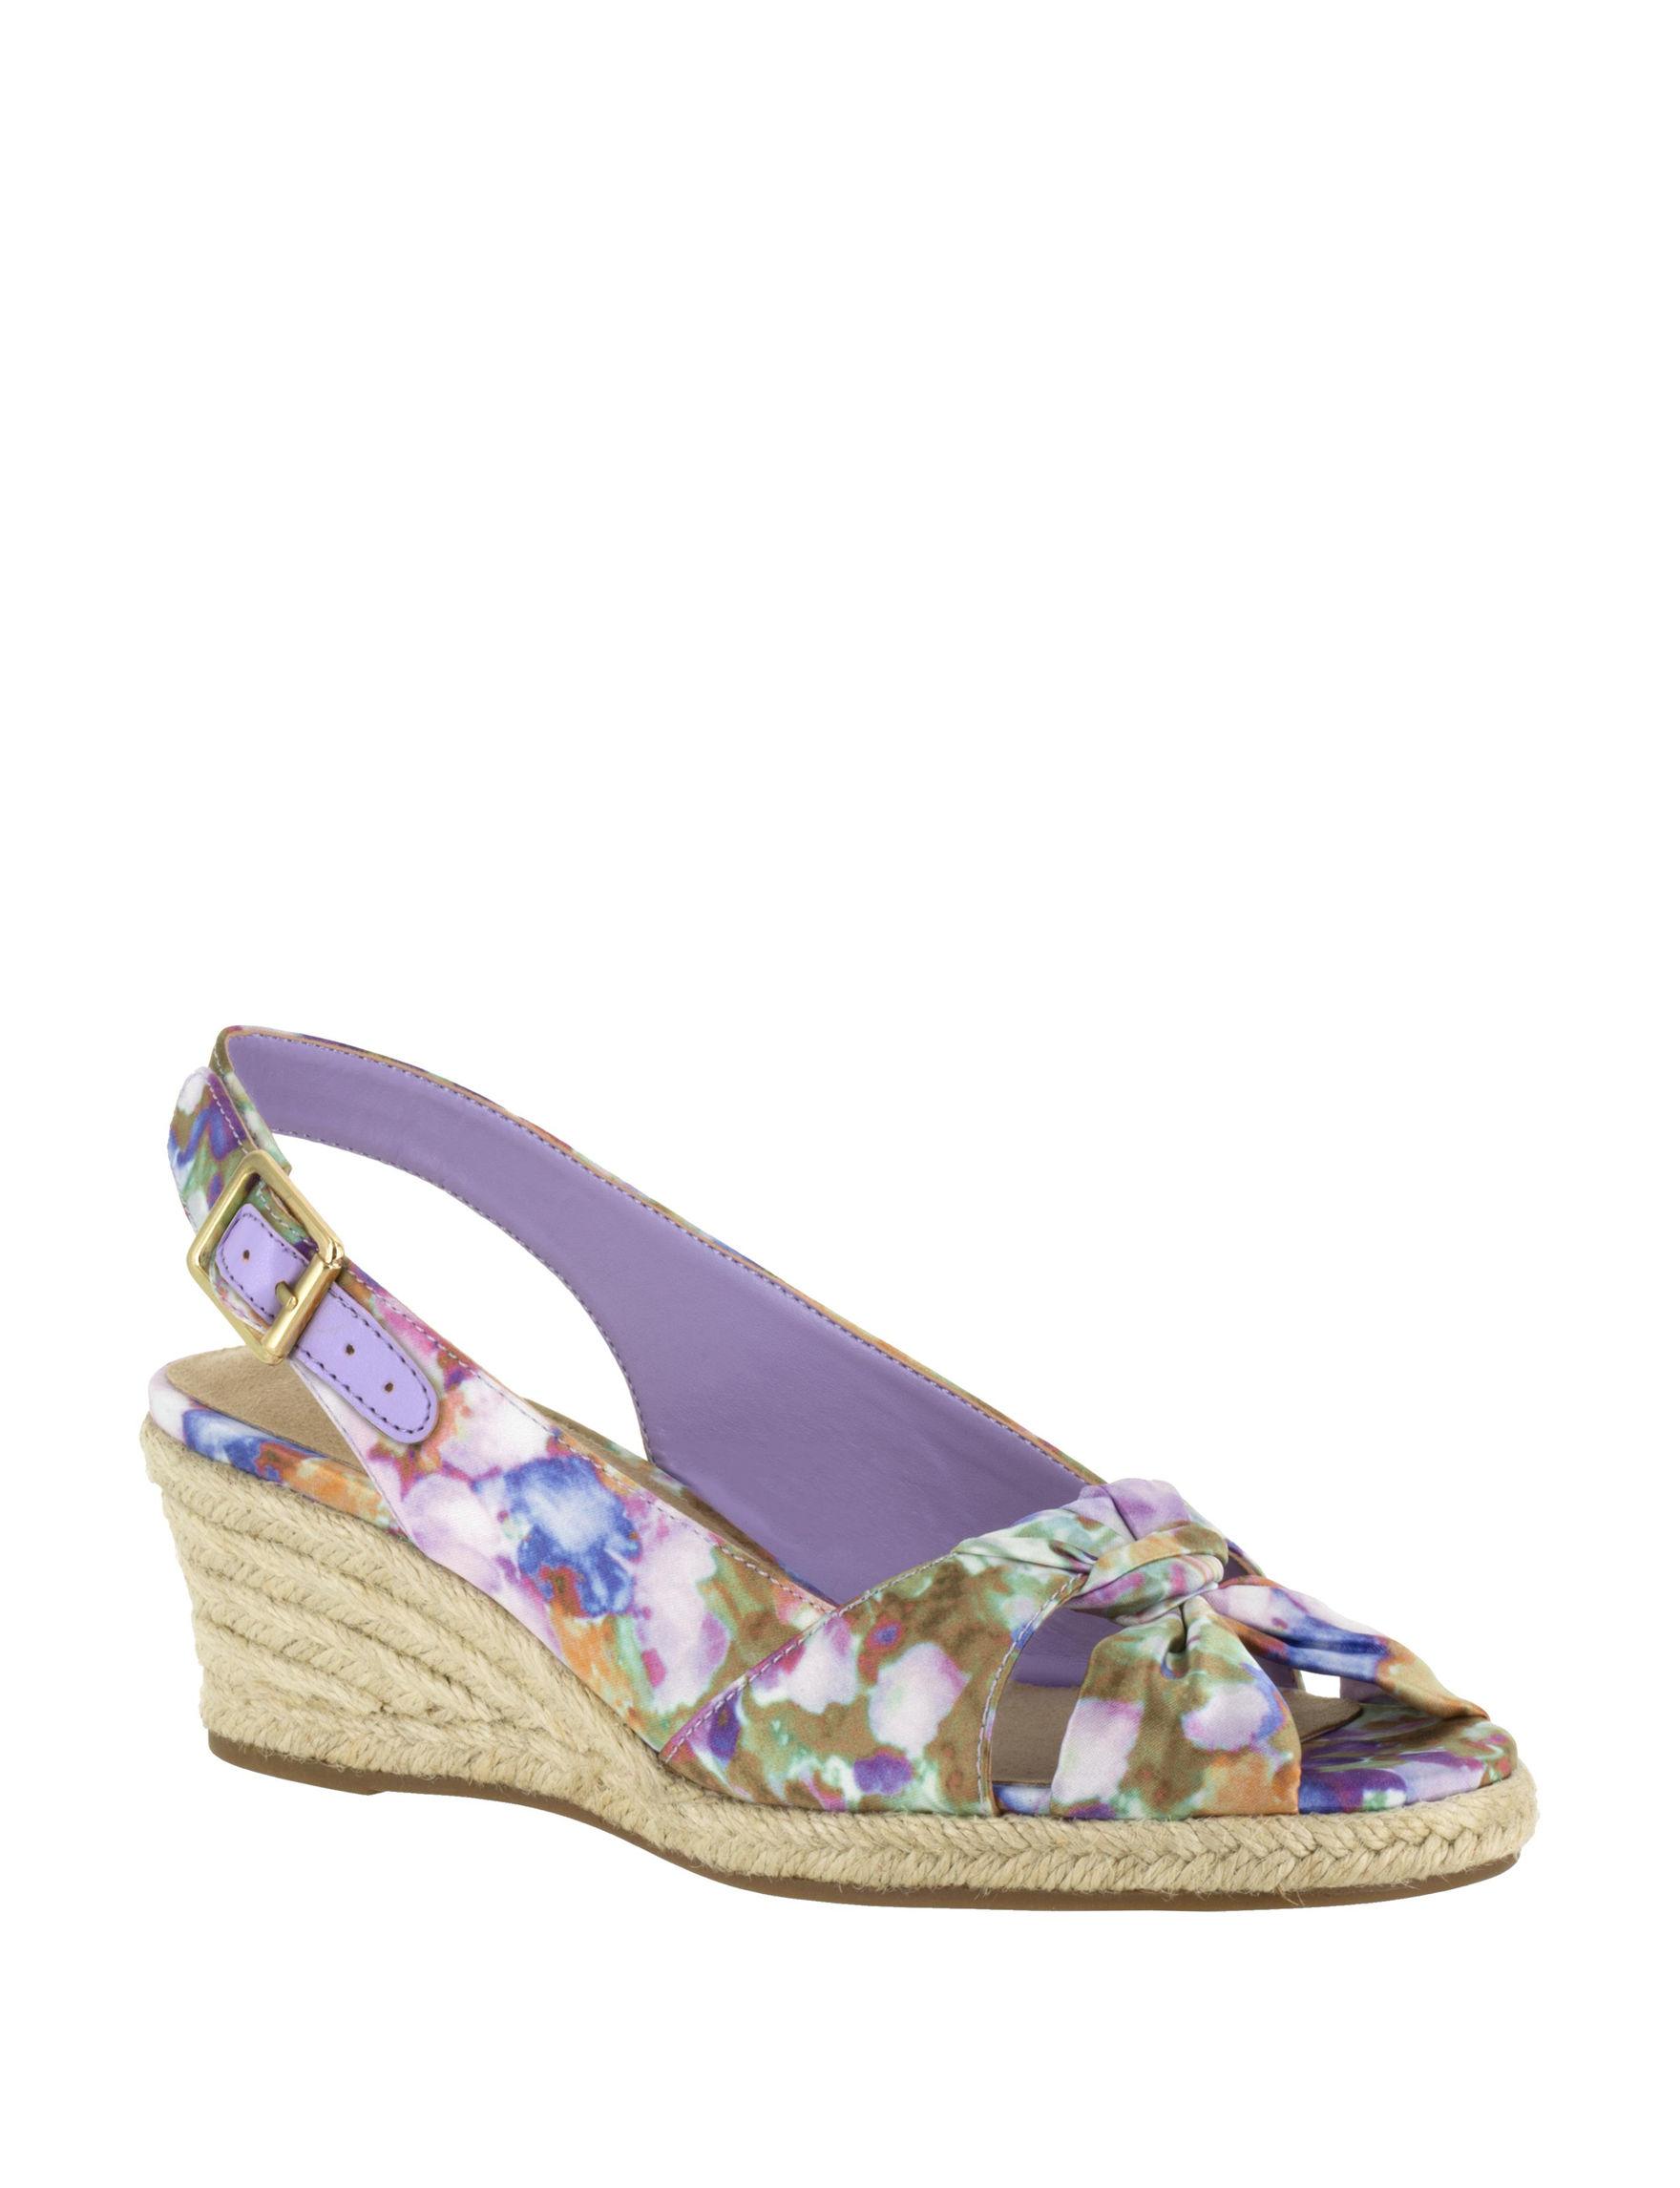 Bella Vita Purple Floral Wedge Sandals